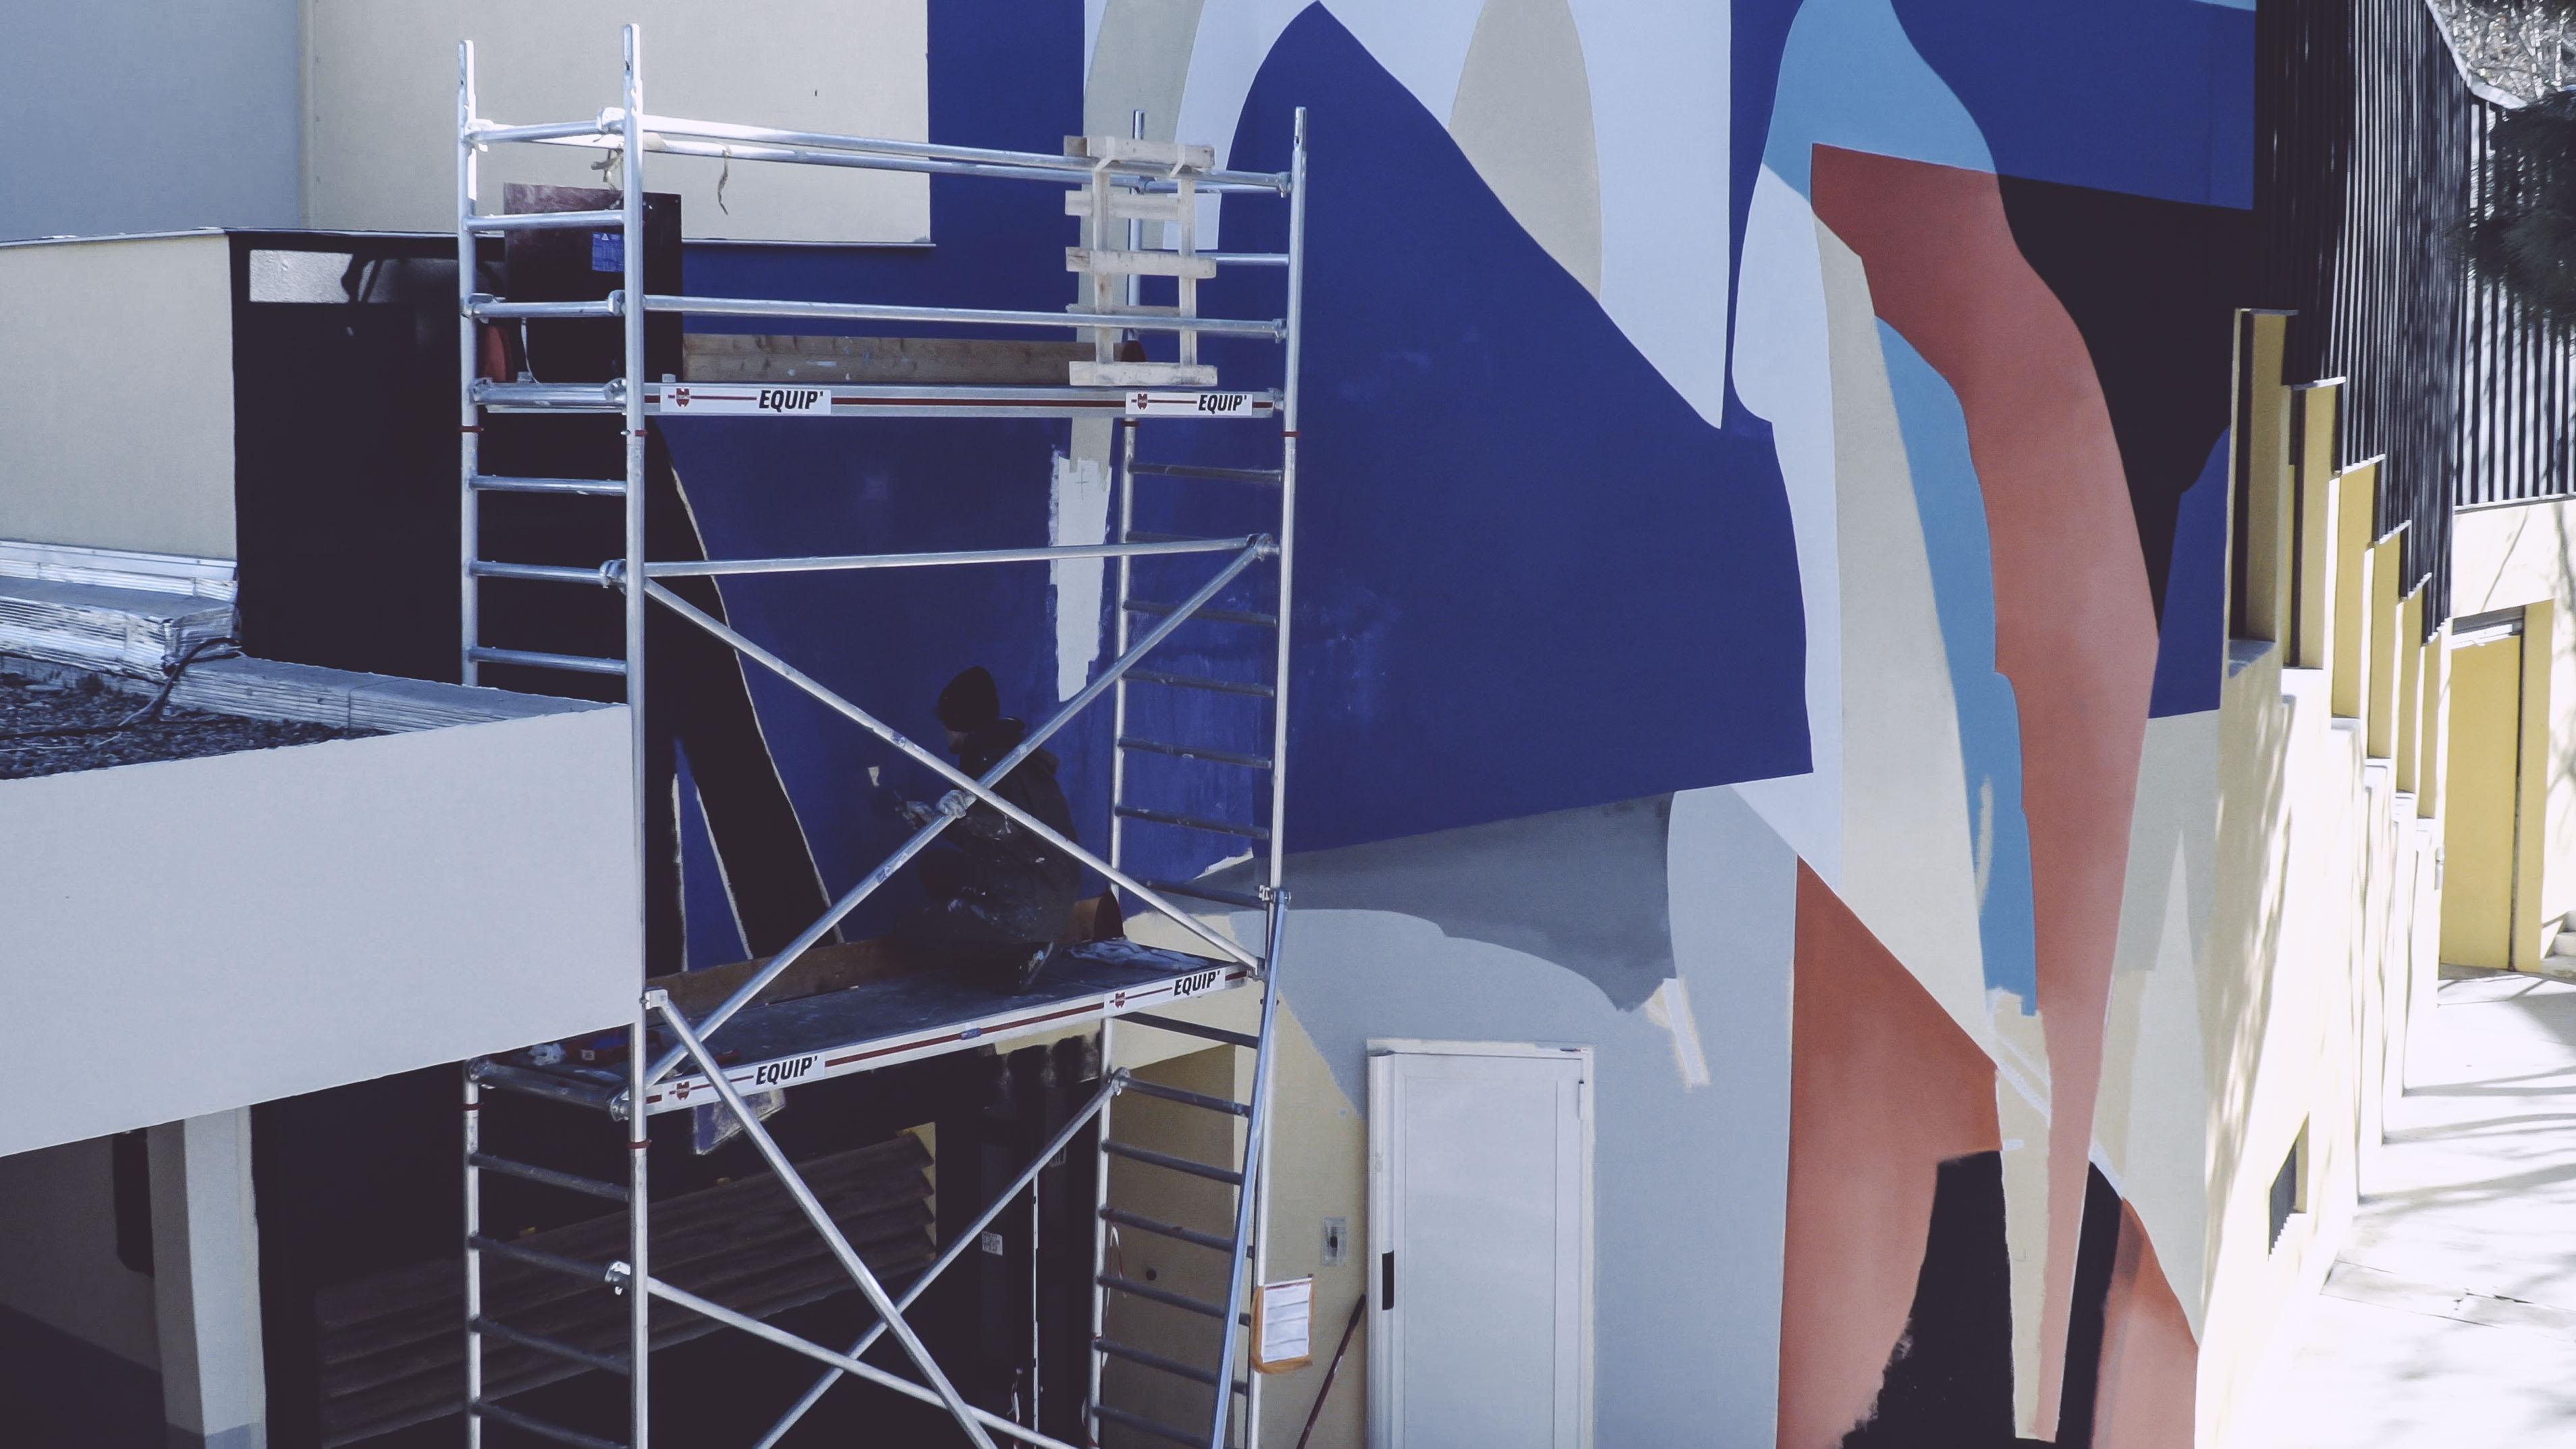 Blo new mural in Perpignan, France Artes & contextos AM fgokhinllkdlbnml